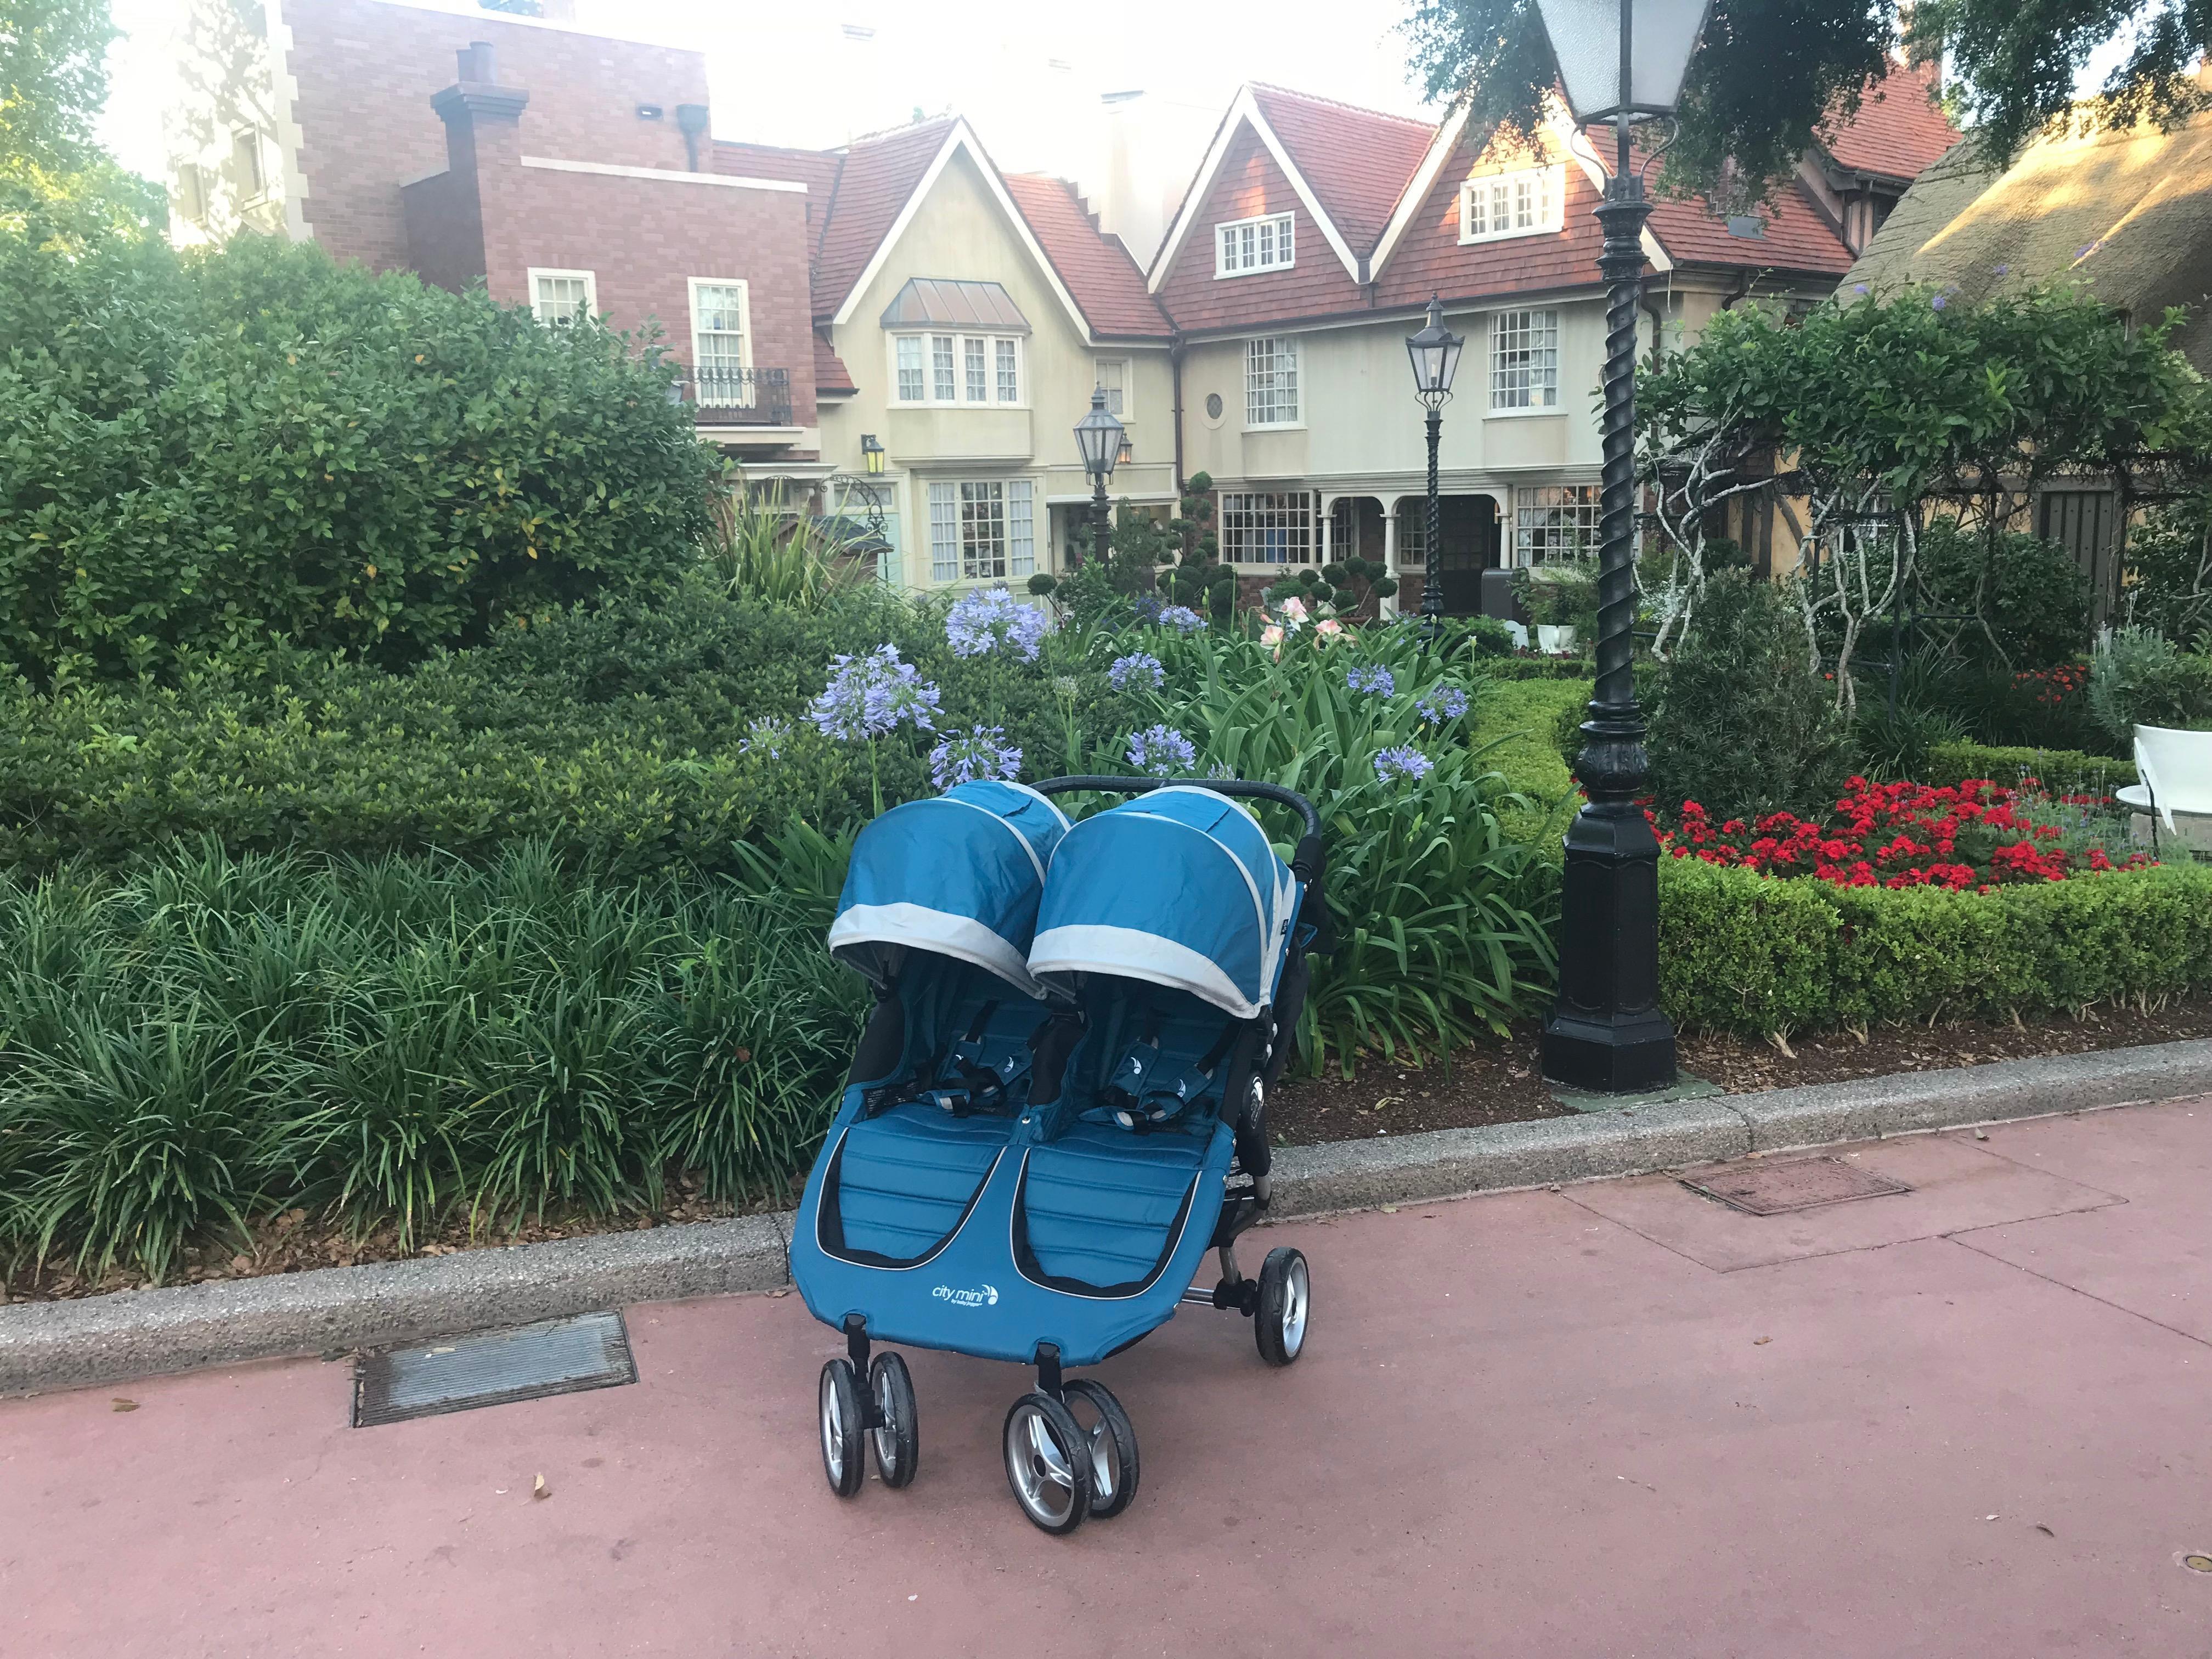 Stroller Rentals Disney image 19